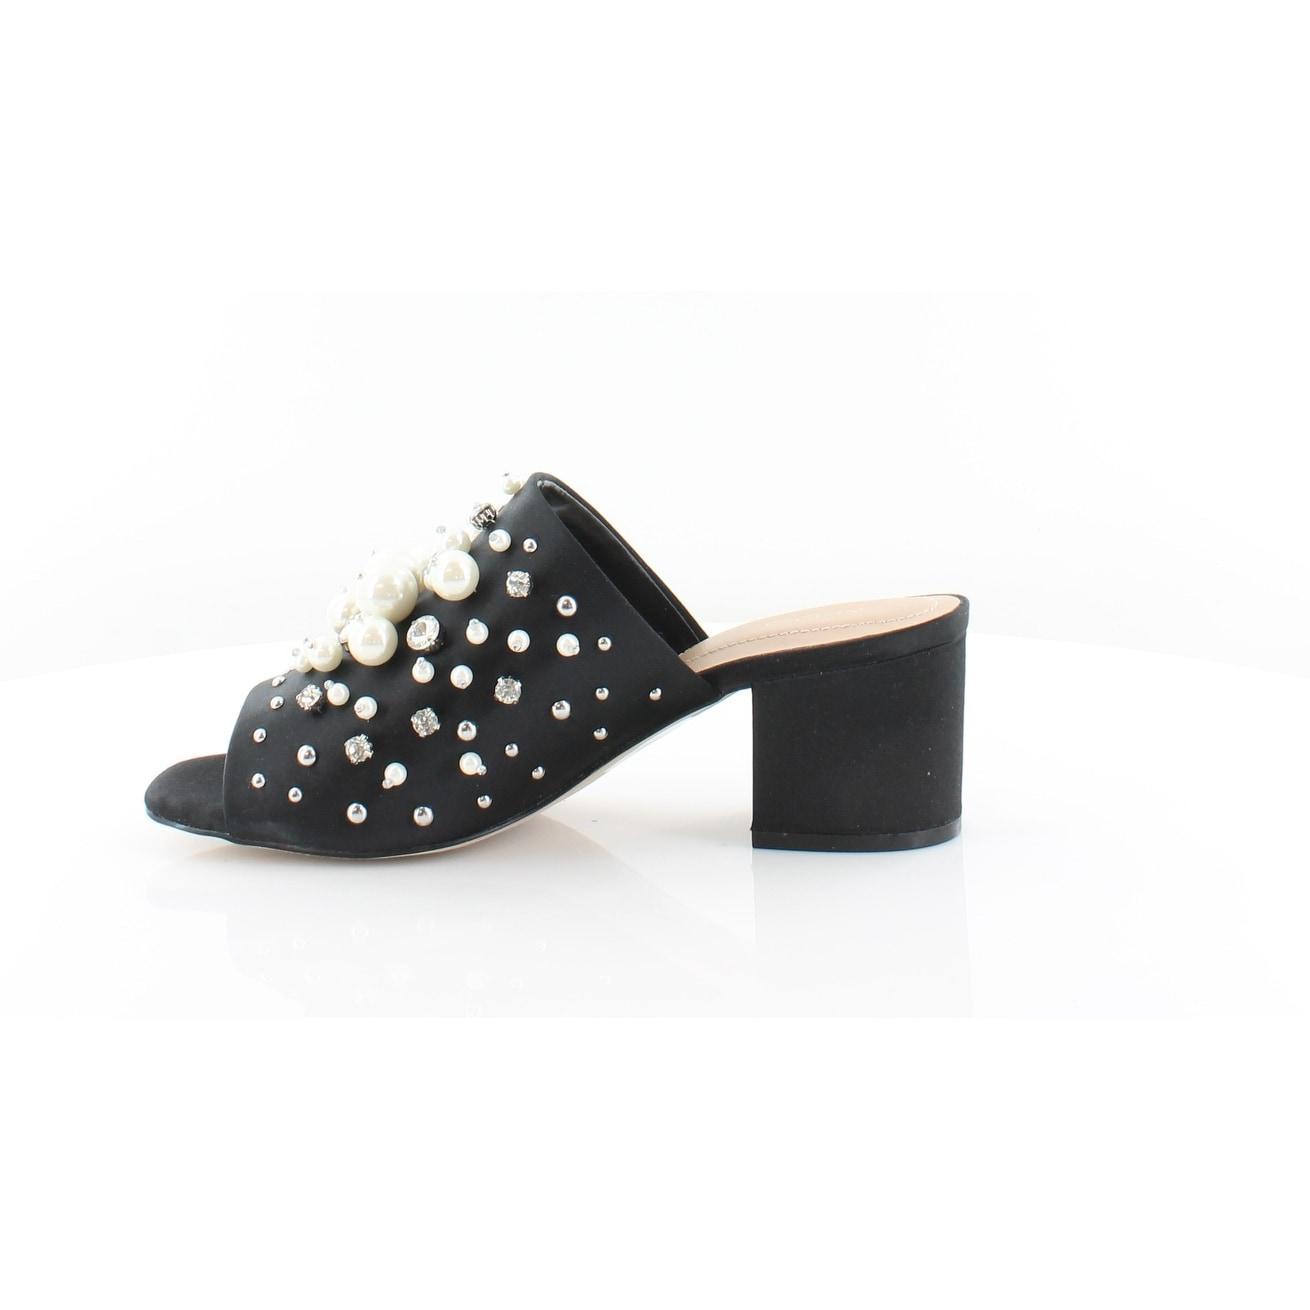 Shop Aldo Pearls Women s Sandals   Flip Flops Black - Free Shipping Today -  Overstock - 21551284